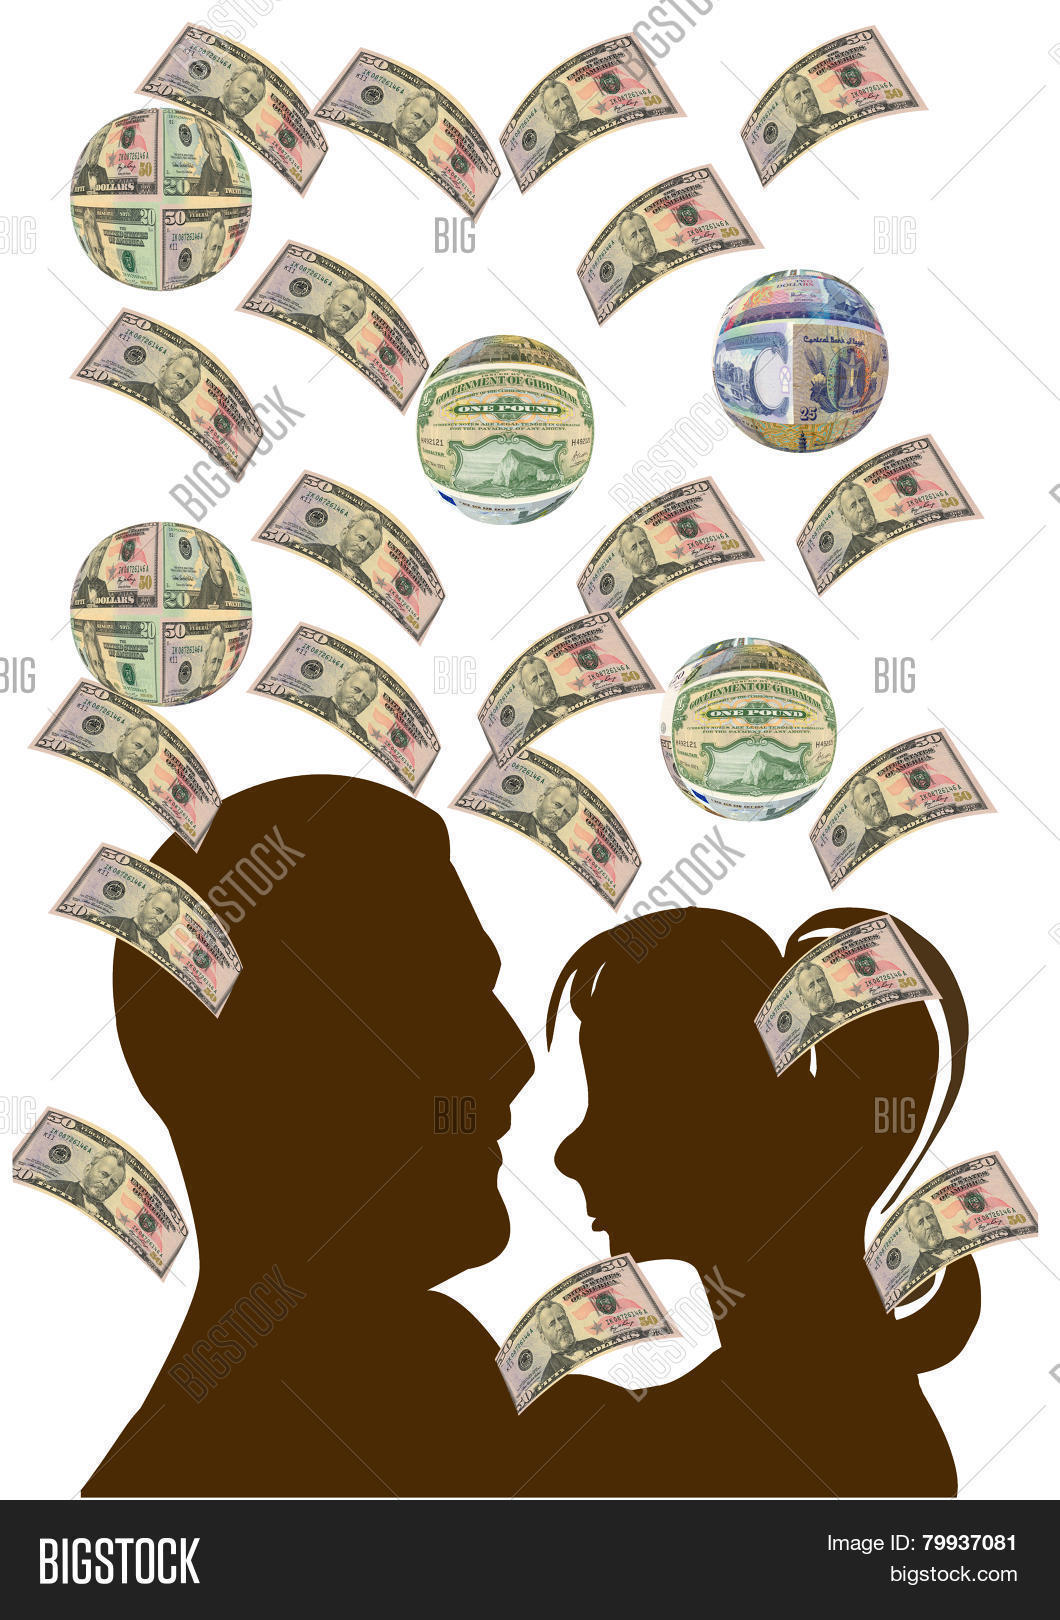 Money Raining Down On Image Photo Free Trial Bigstock